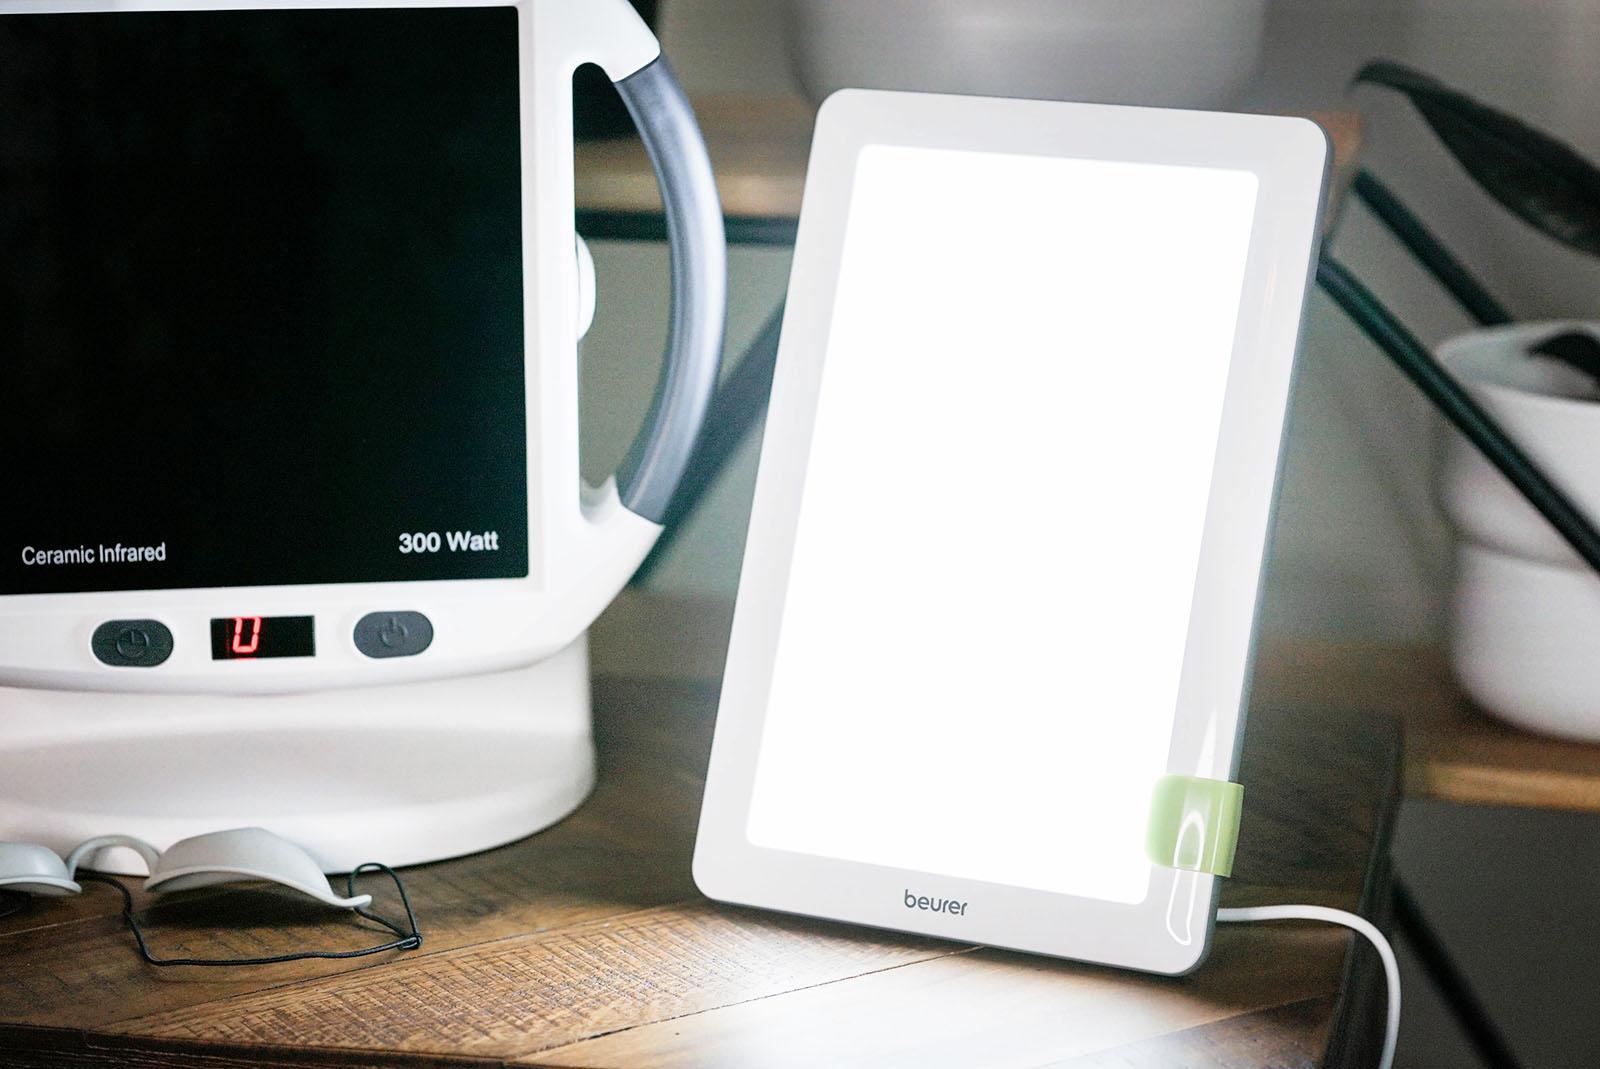 Beurer daylight lamp review